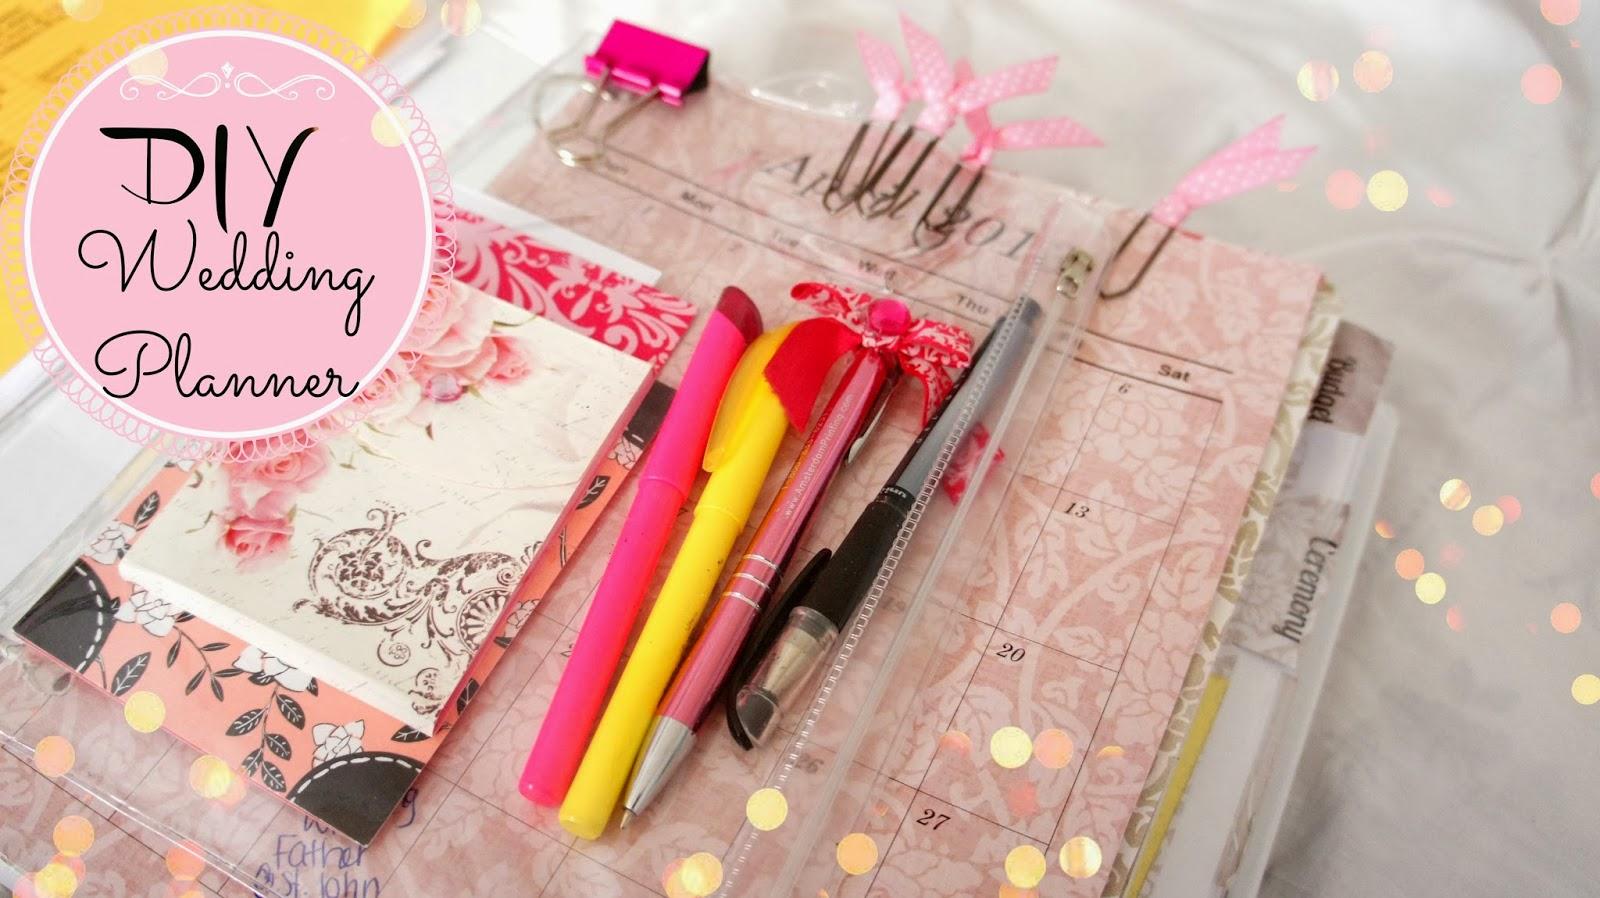 wedding planning time wedding planner binder BelindaSelene DIY Wedding Planner Save Money Time And Stress